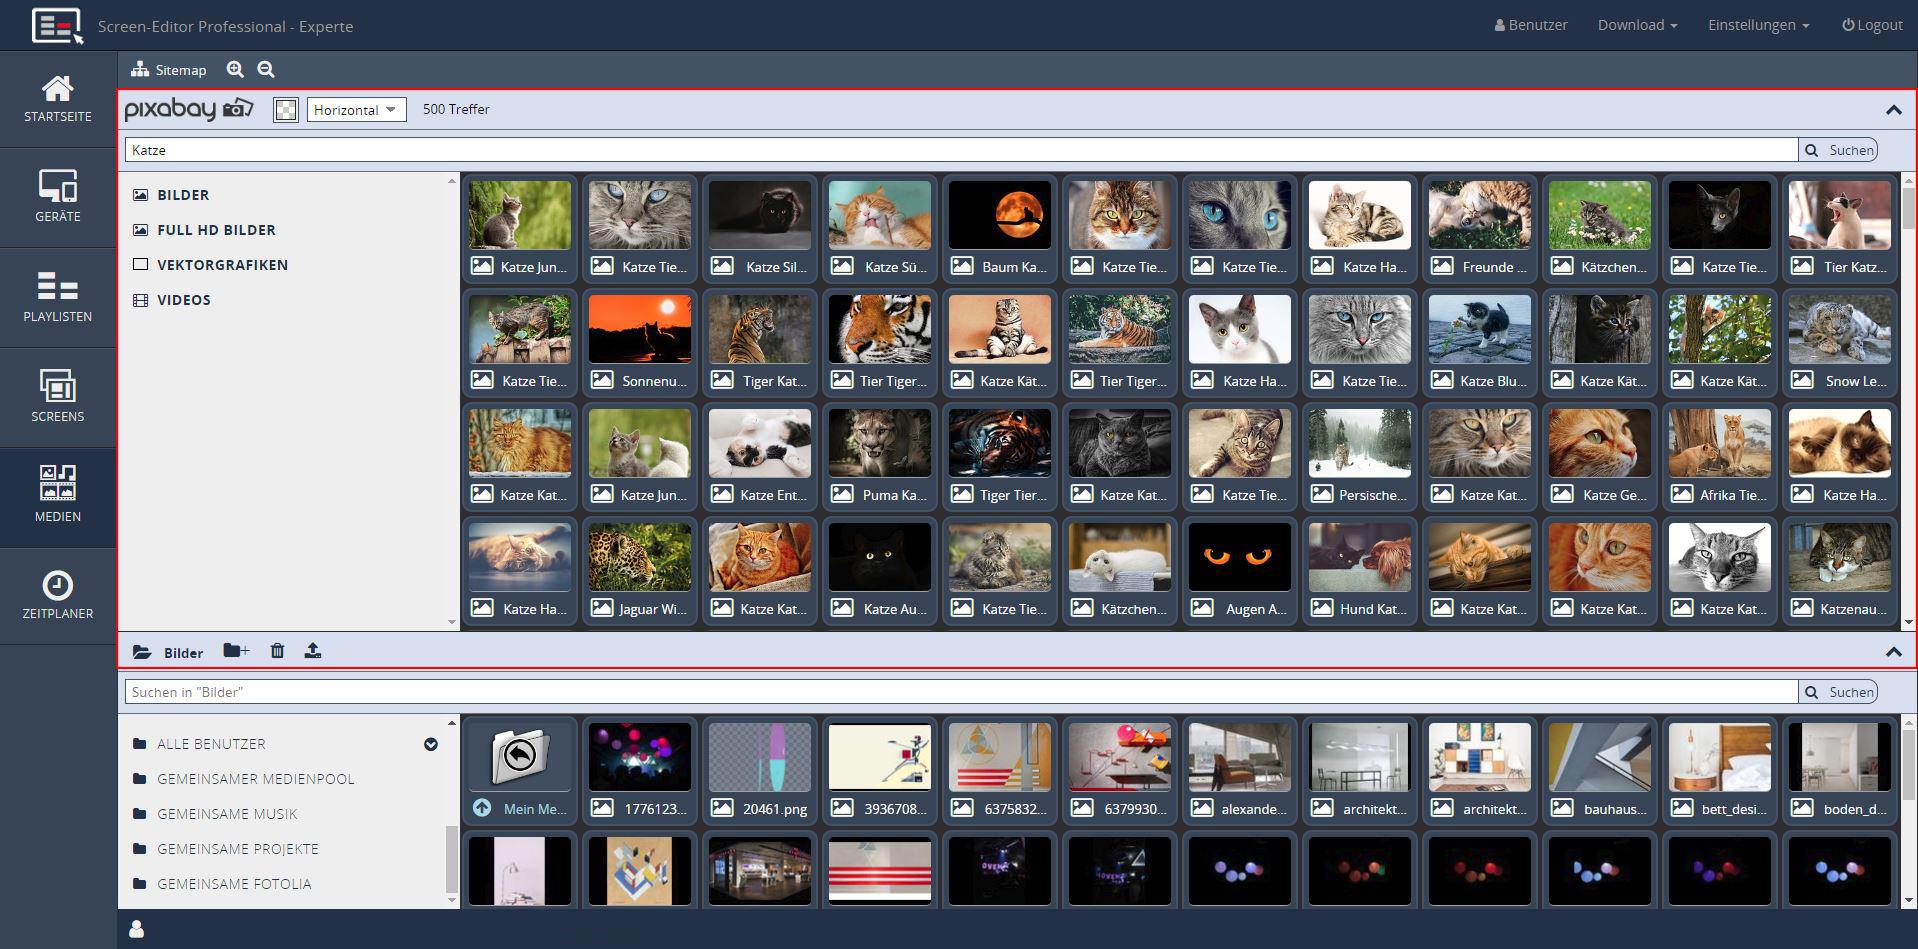 integrierte_foto_video-Datenbank